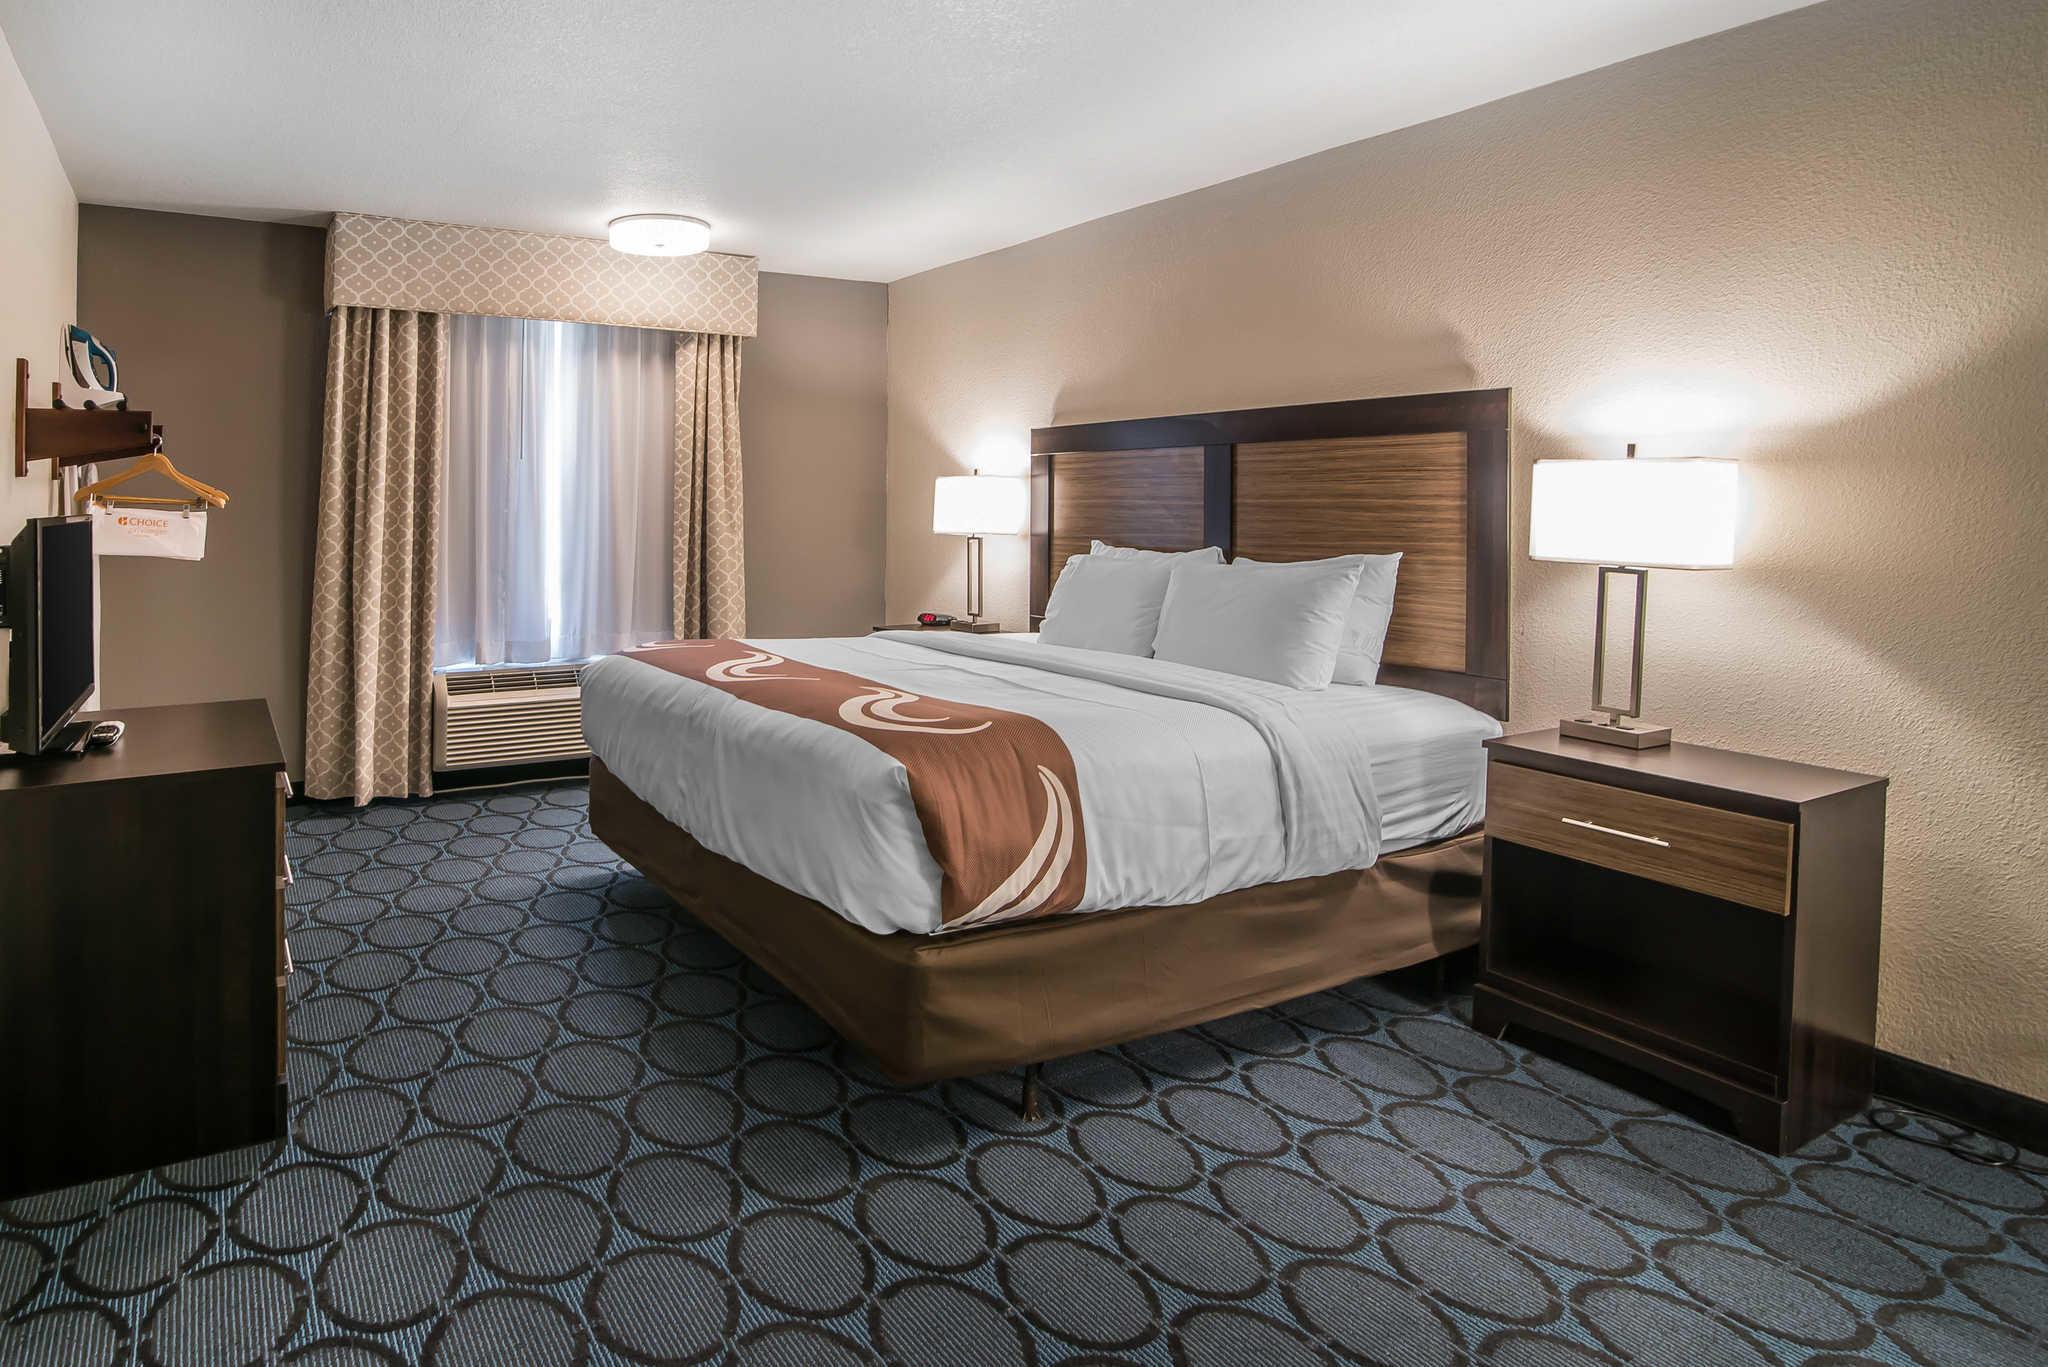 Quality Inn & Suites - Ruidoso Hwy 70 image 15